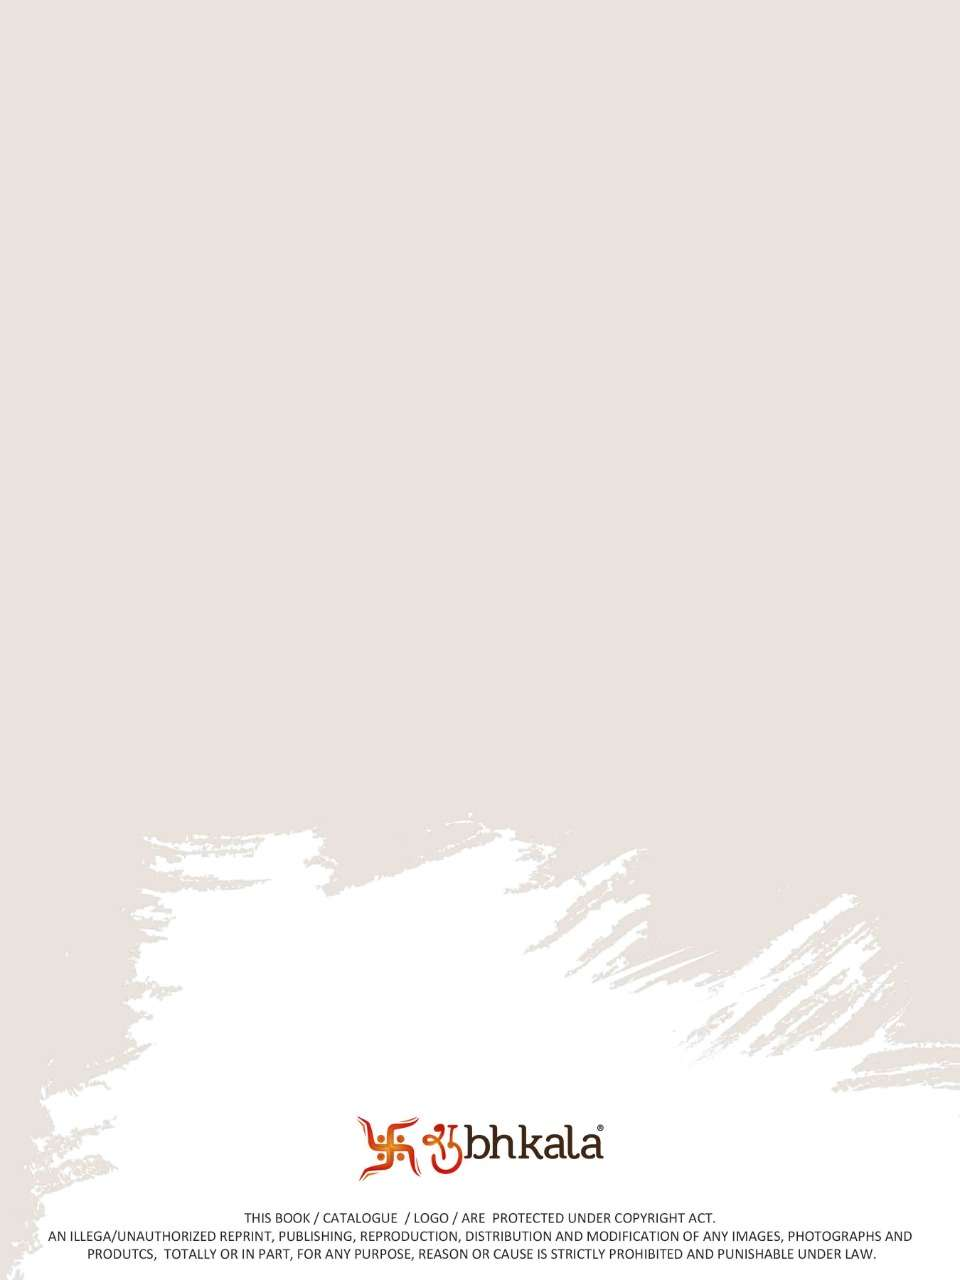 SHUBHAKALA GLRY VOL 16 SILK WITH PRINTED WORK WEDDING WEAR LEHENGA CHOLI COLLECTION